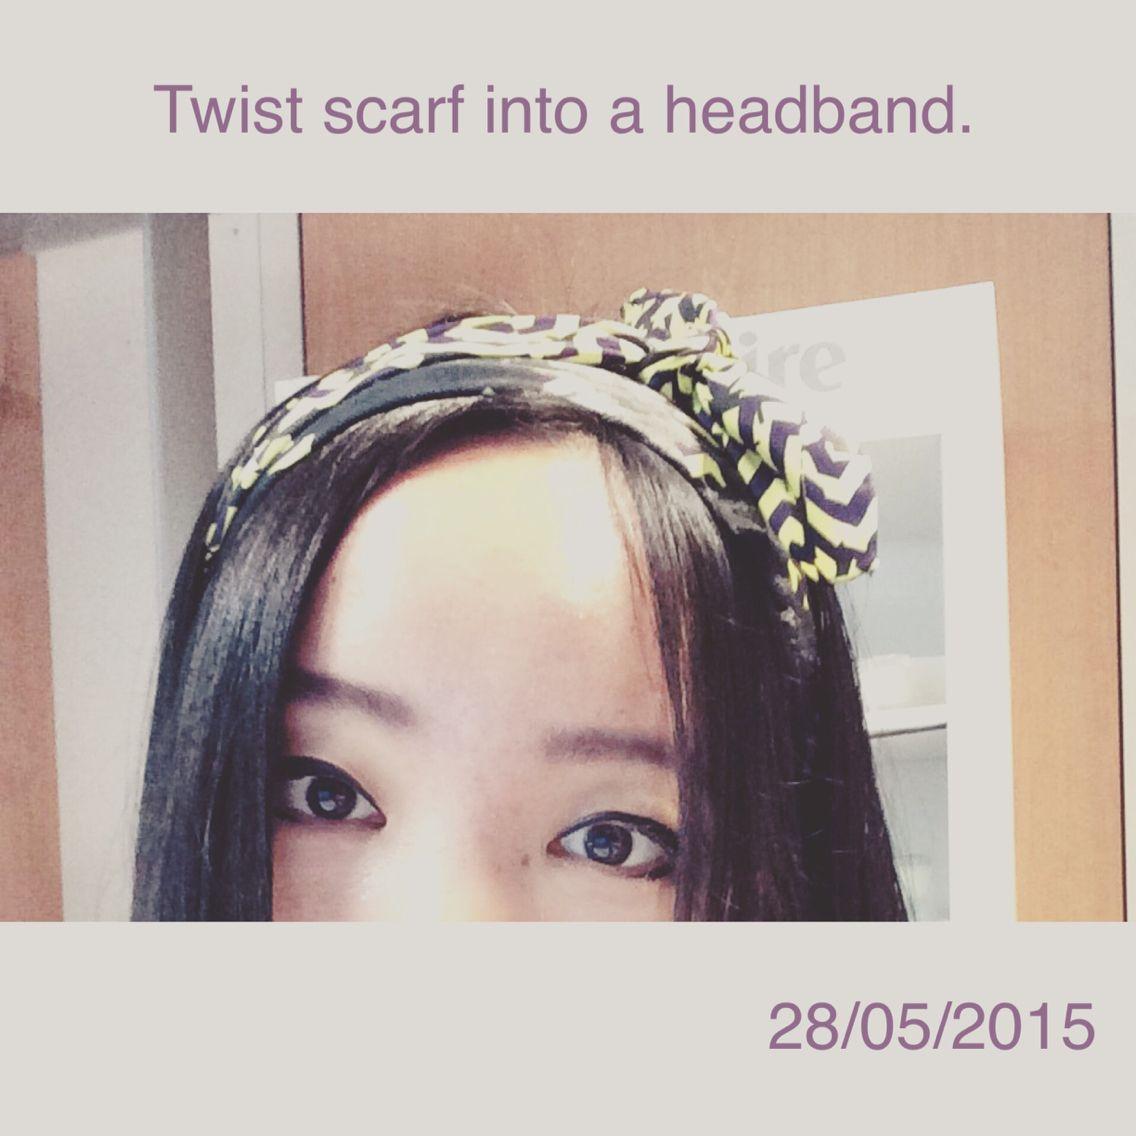 twist scarf into a headband